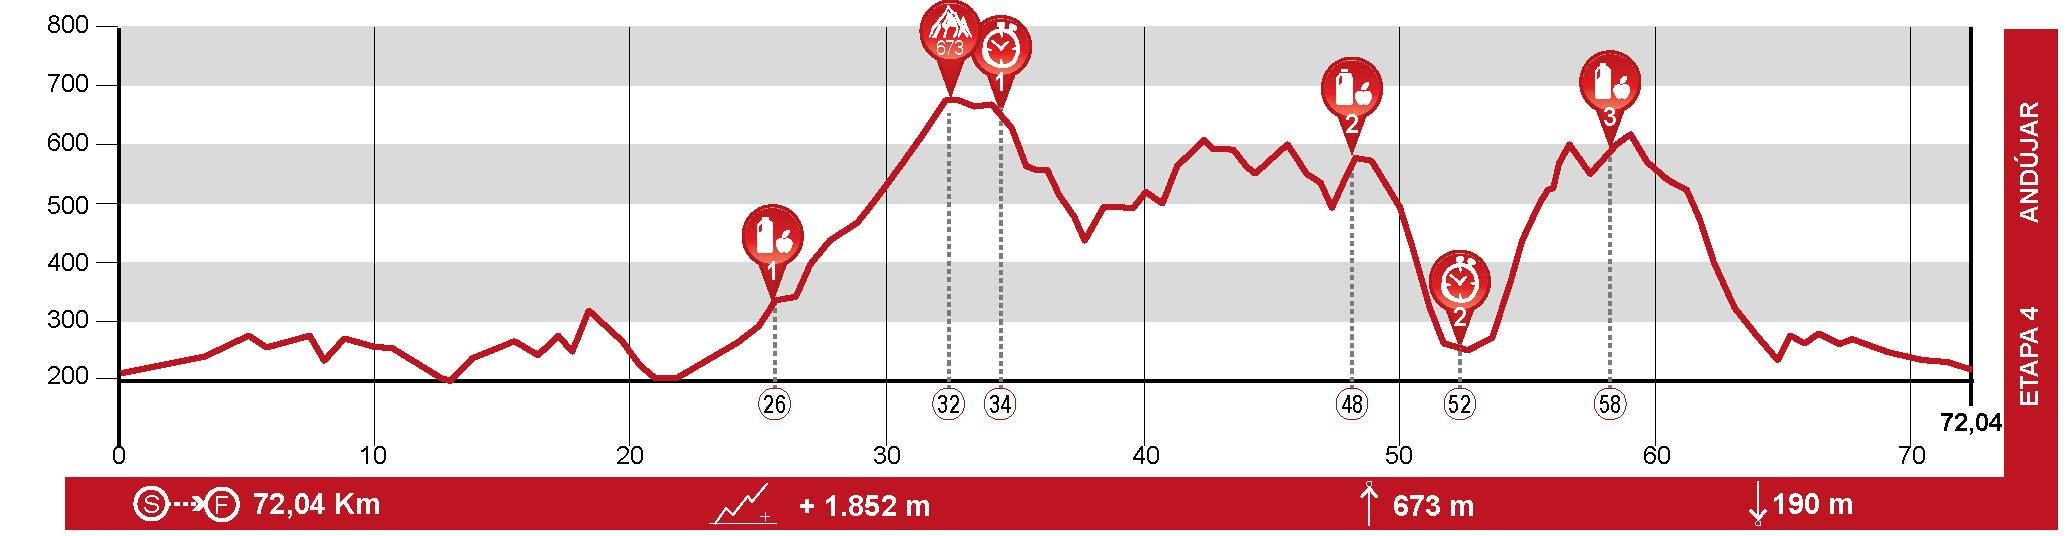 Andalucía Bike Race - Etapa 4